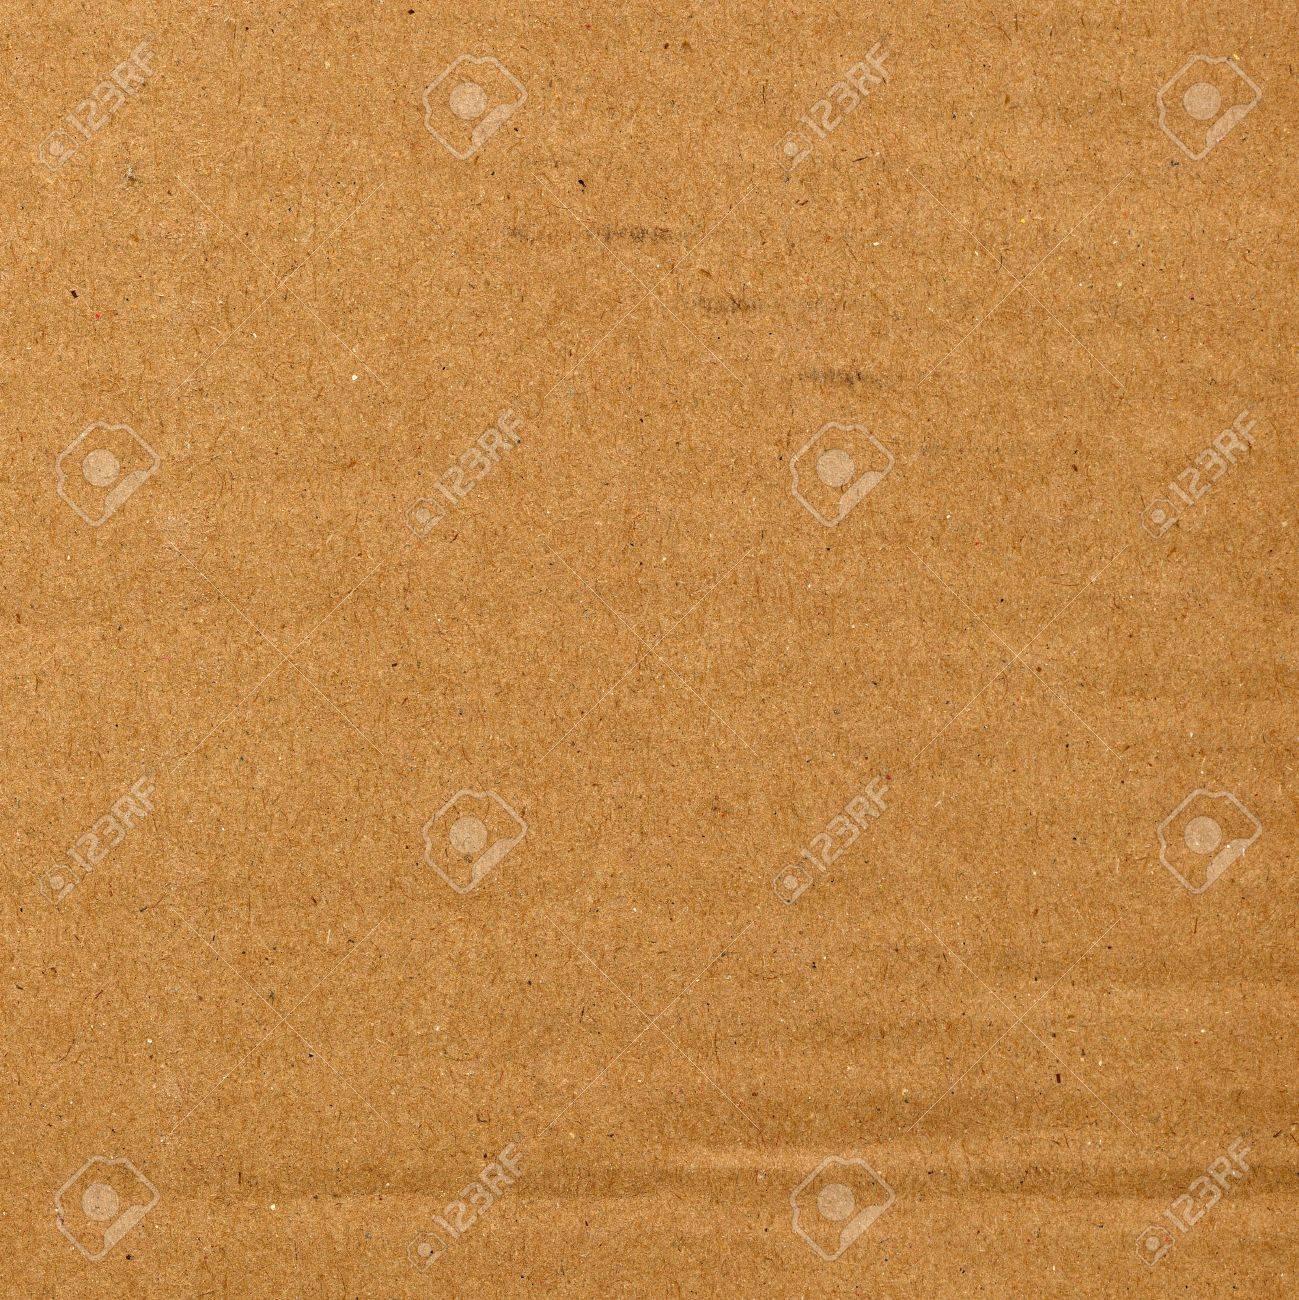 Brown corrugated cardboard sheet background Stock Photo - 3183546